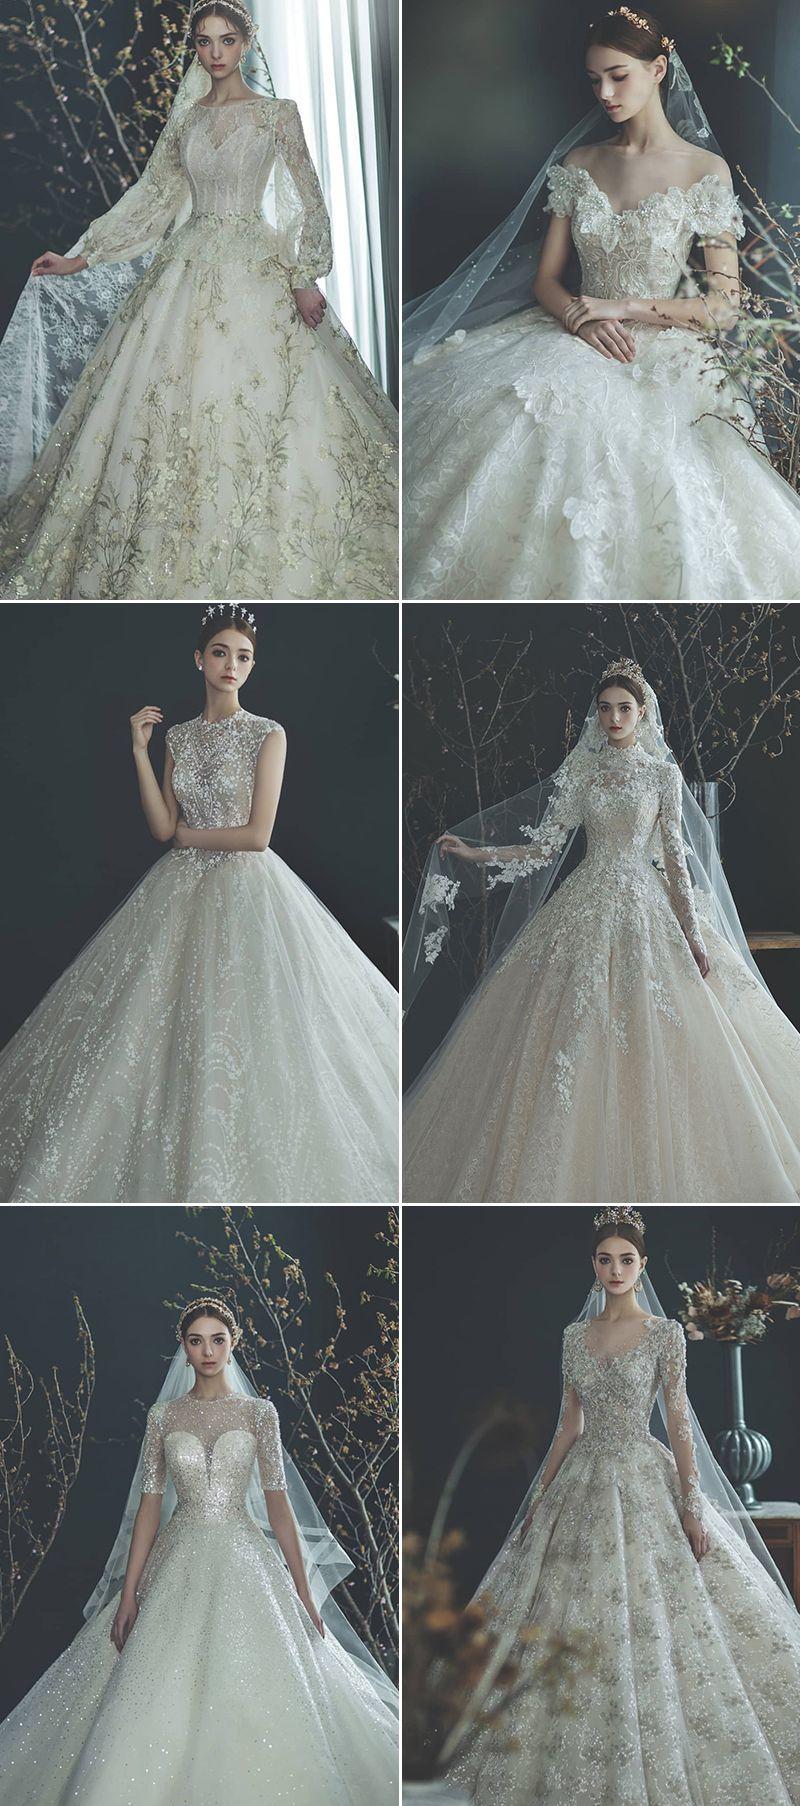 40 Modern Fairytale Wedding Dresses Featuring Enchanted Details